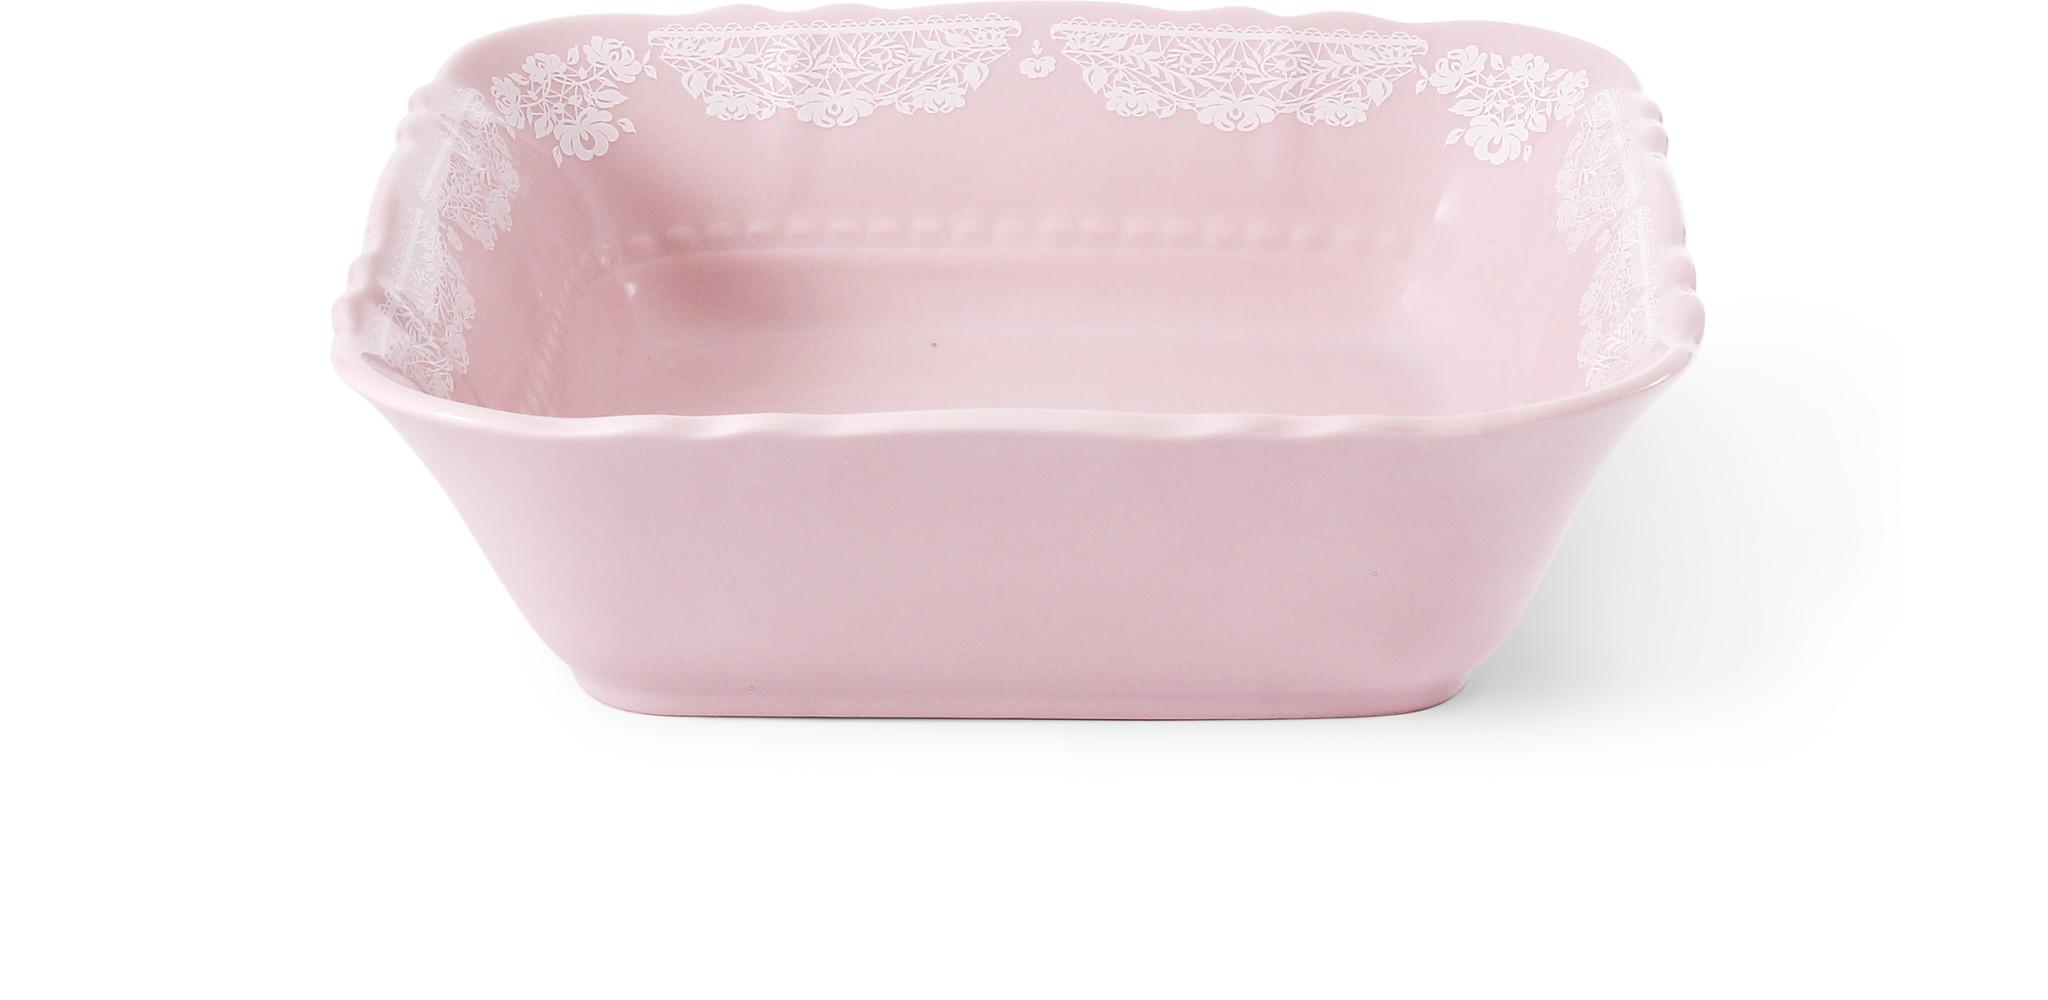 Miska čtyřhranná 17 cm Krajka růžový porcelán